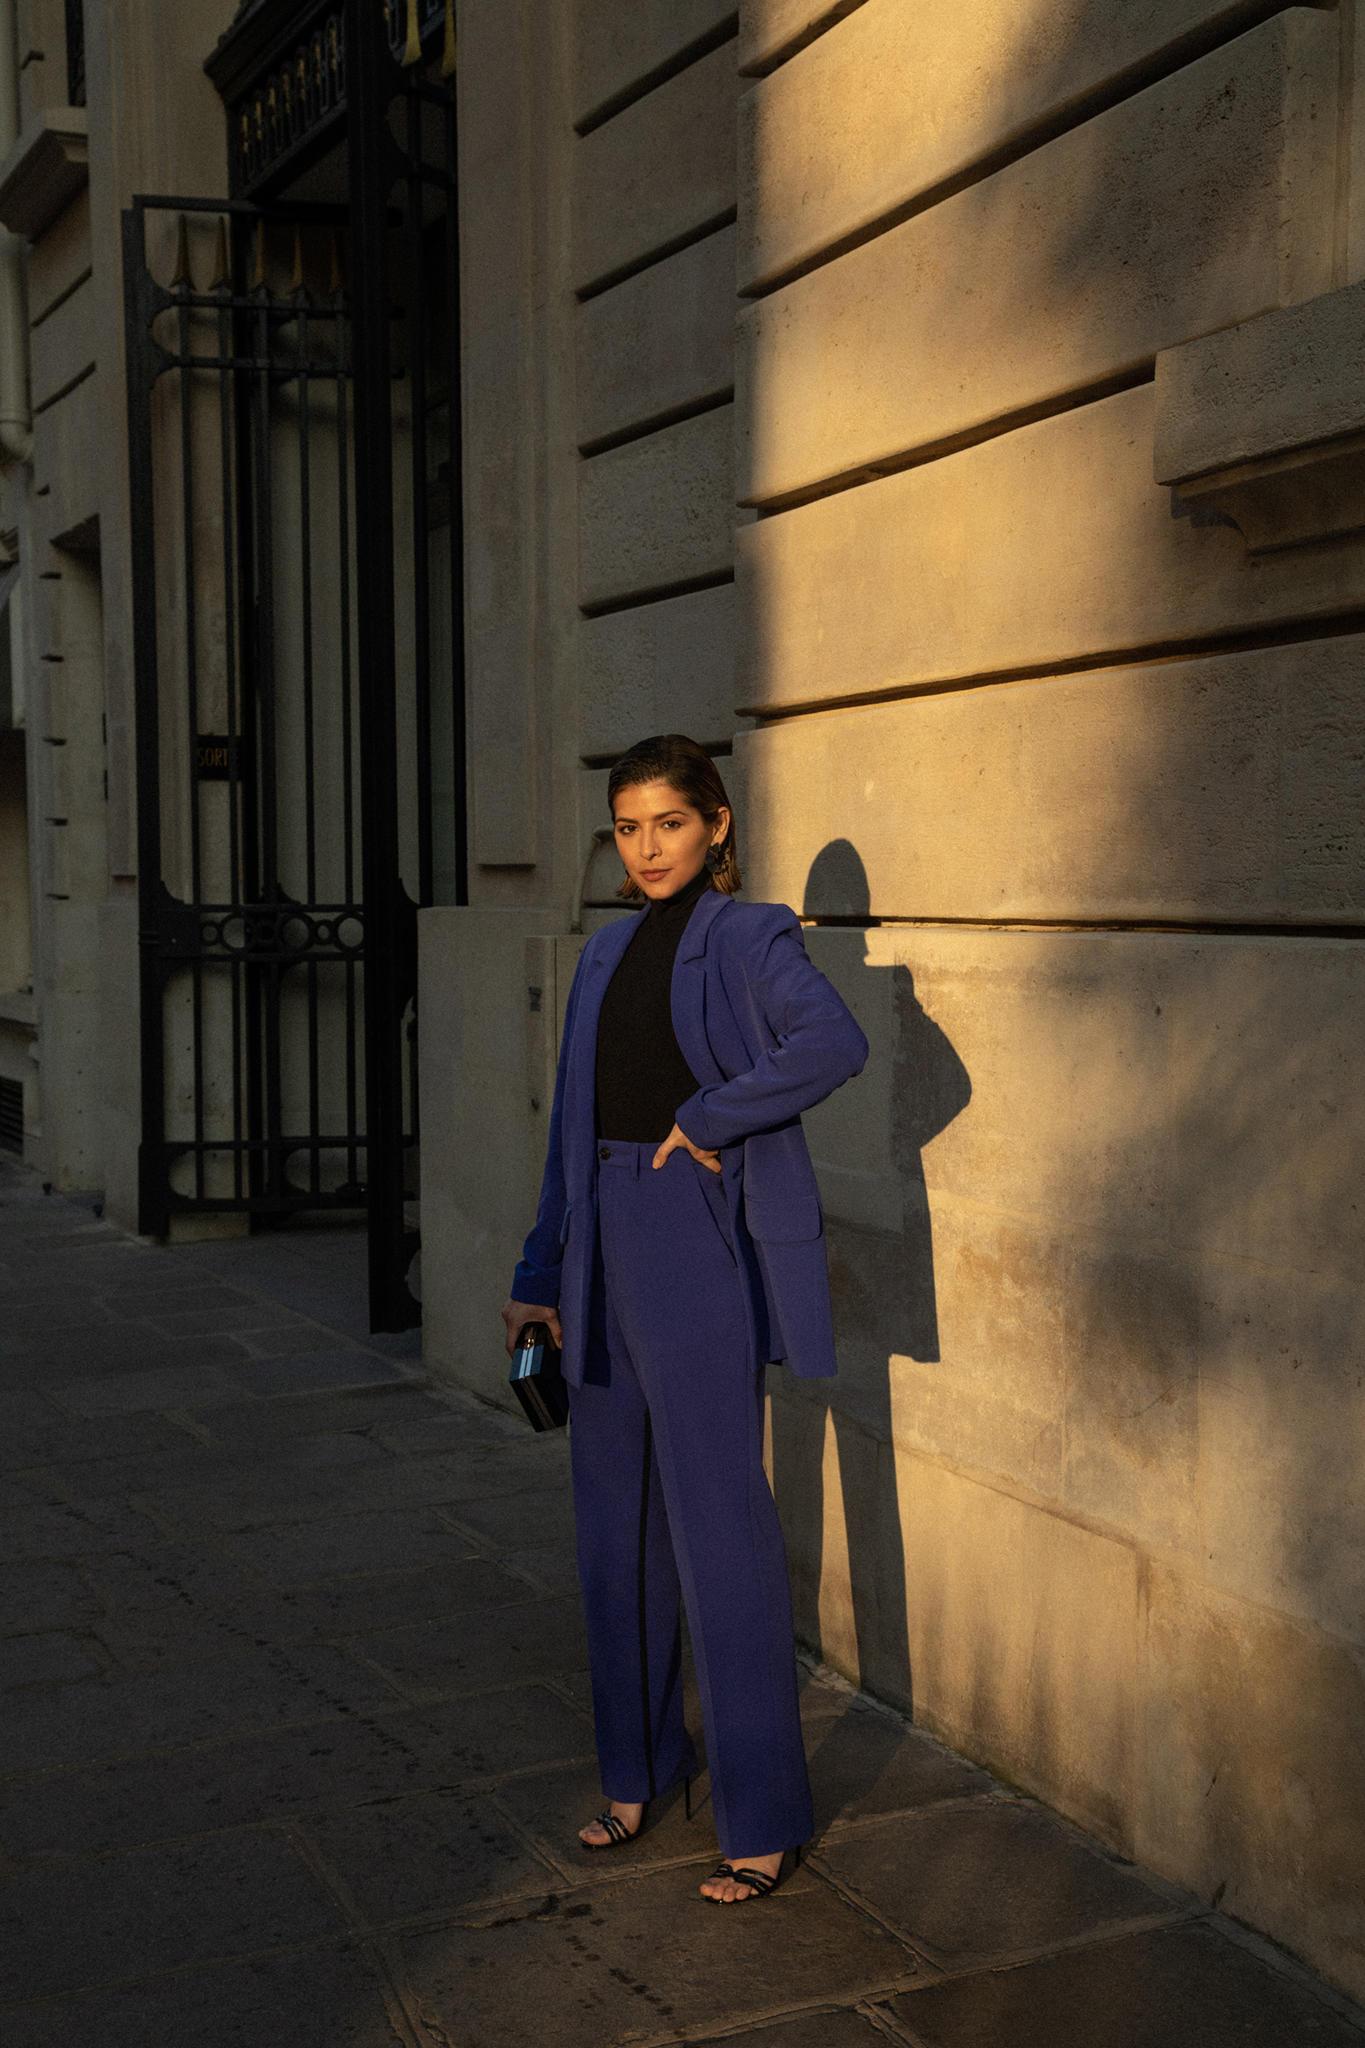 Paris Fashion Week FW19 Recap by Pam Hetlinger | TheGirlFromPanama.com | paris fashion week street style, fashion week spring 2019 street style, purple suit, hair pins trend, sleek hairstyle